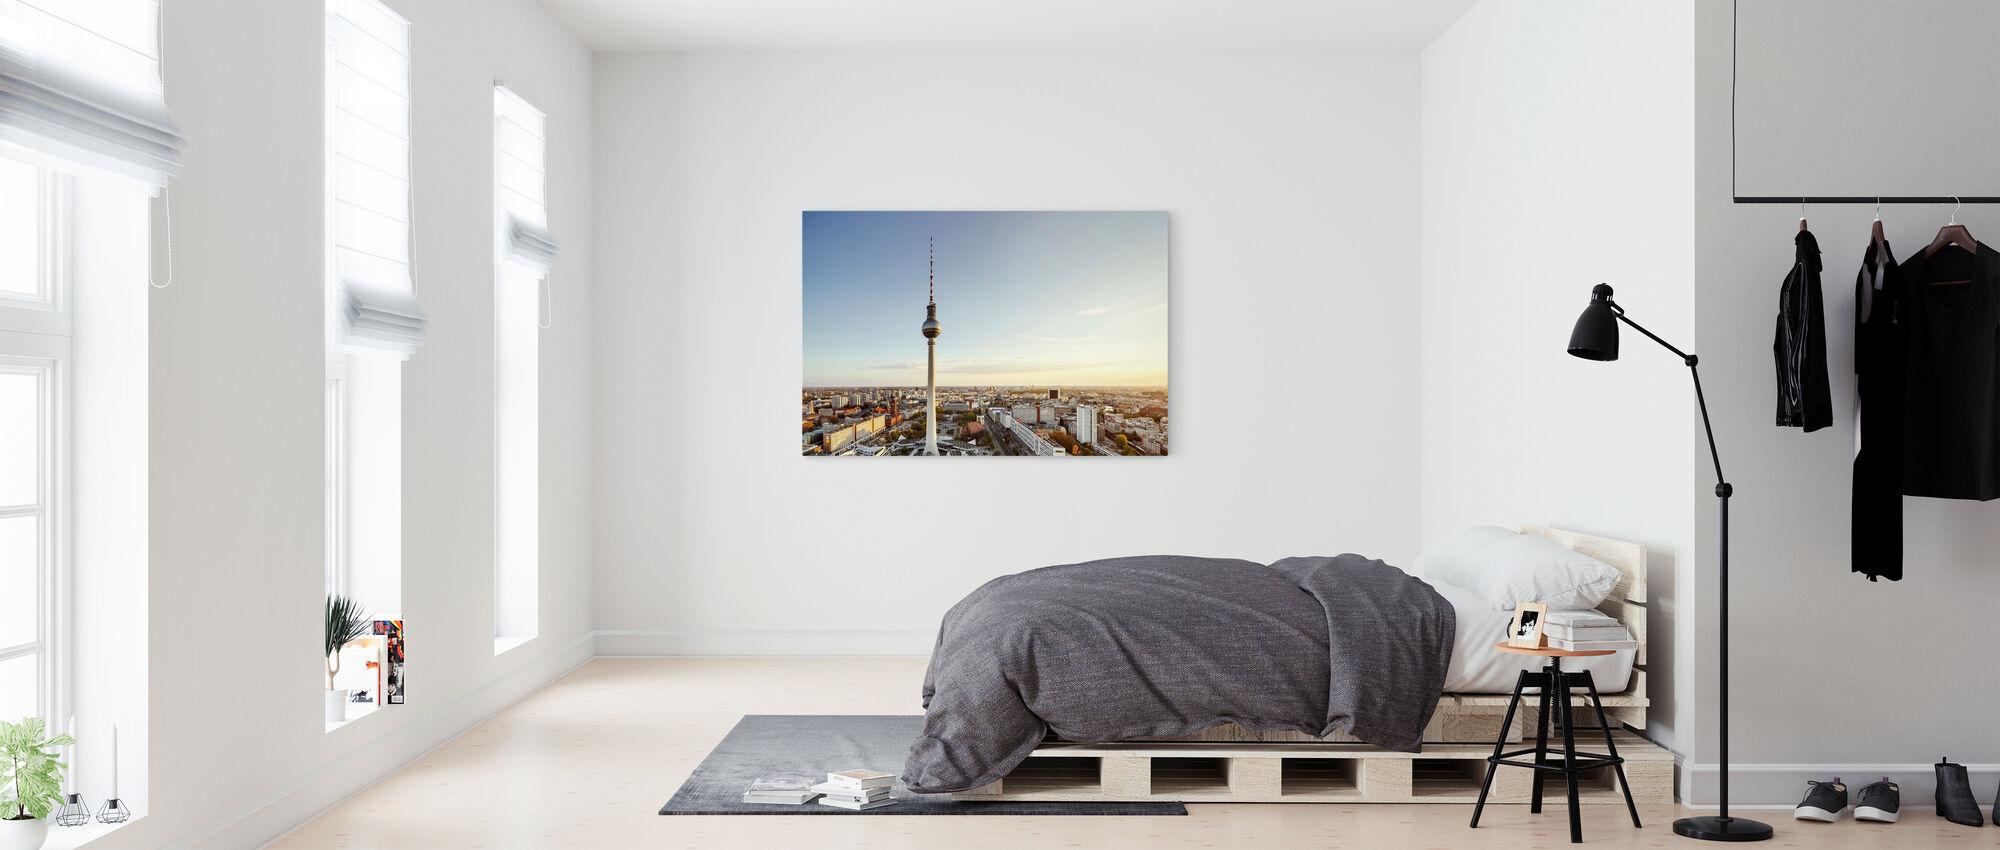 Berliinin TV-torni auringonlaskun aikaan - Canvastaulu - Makuuhuone